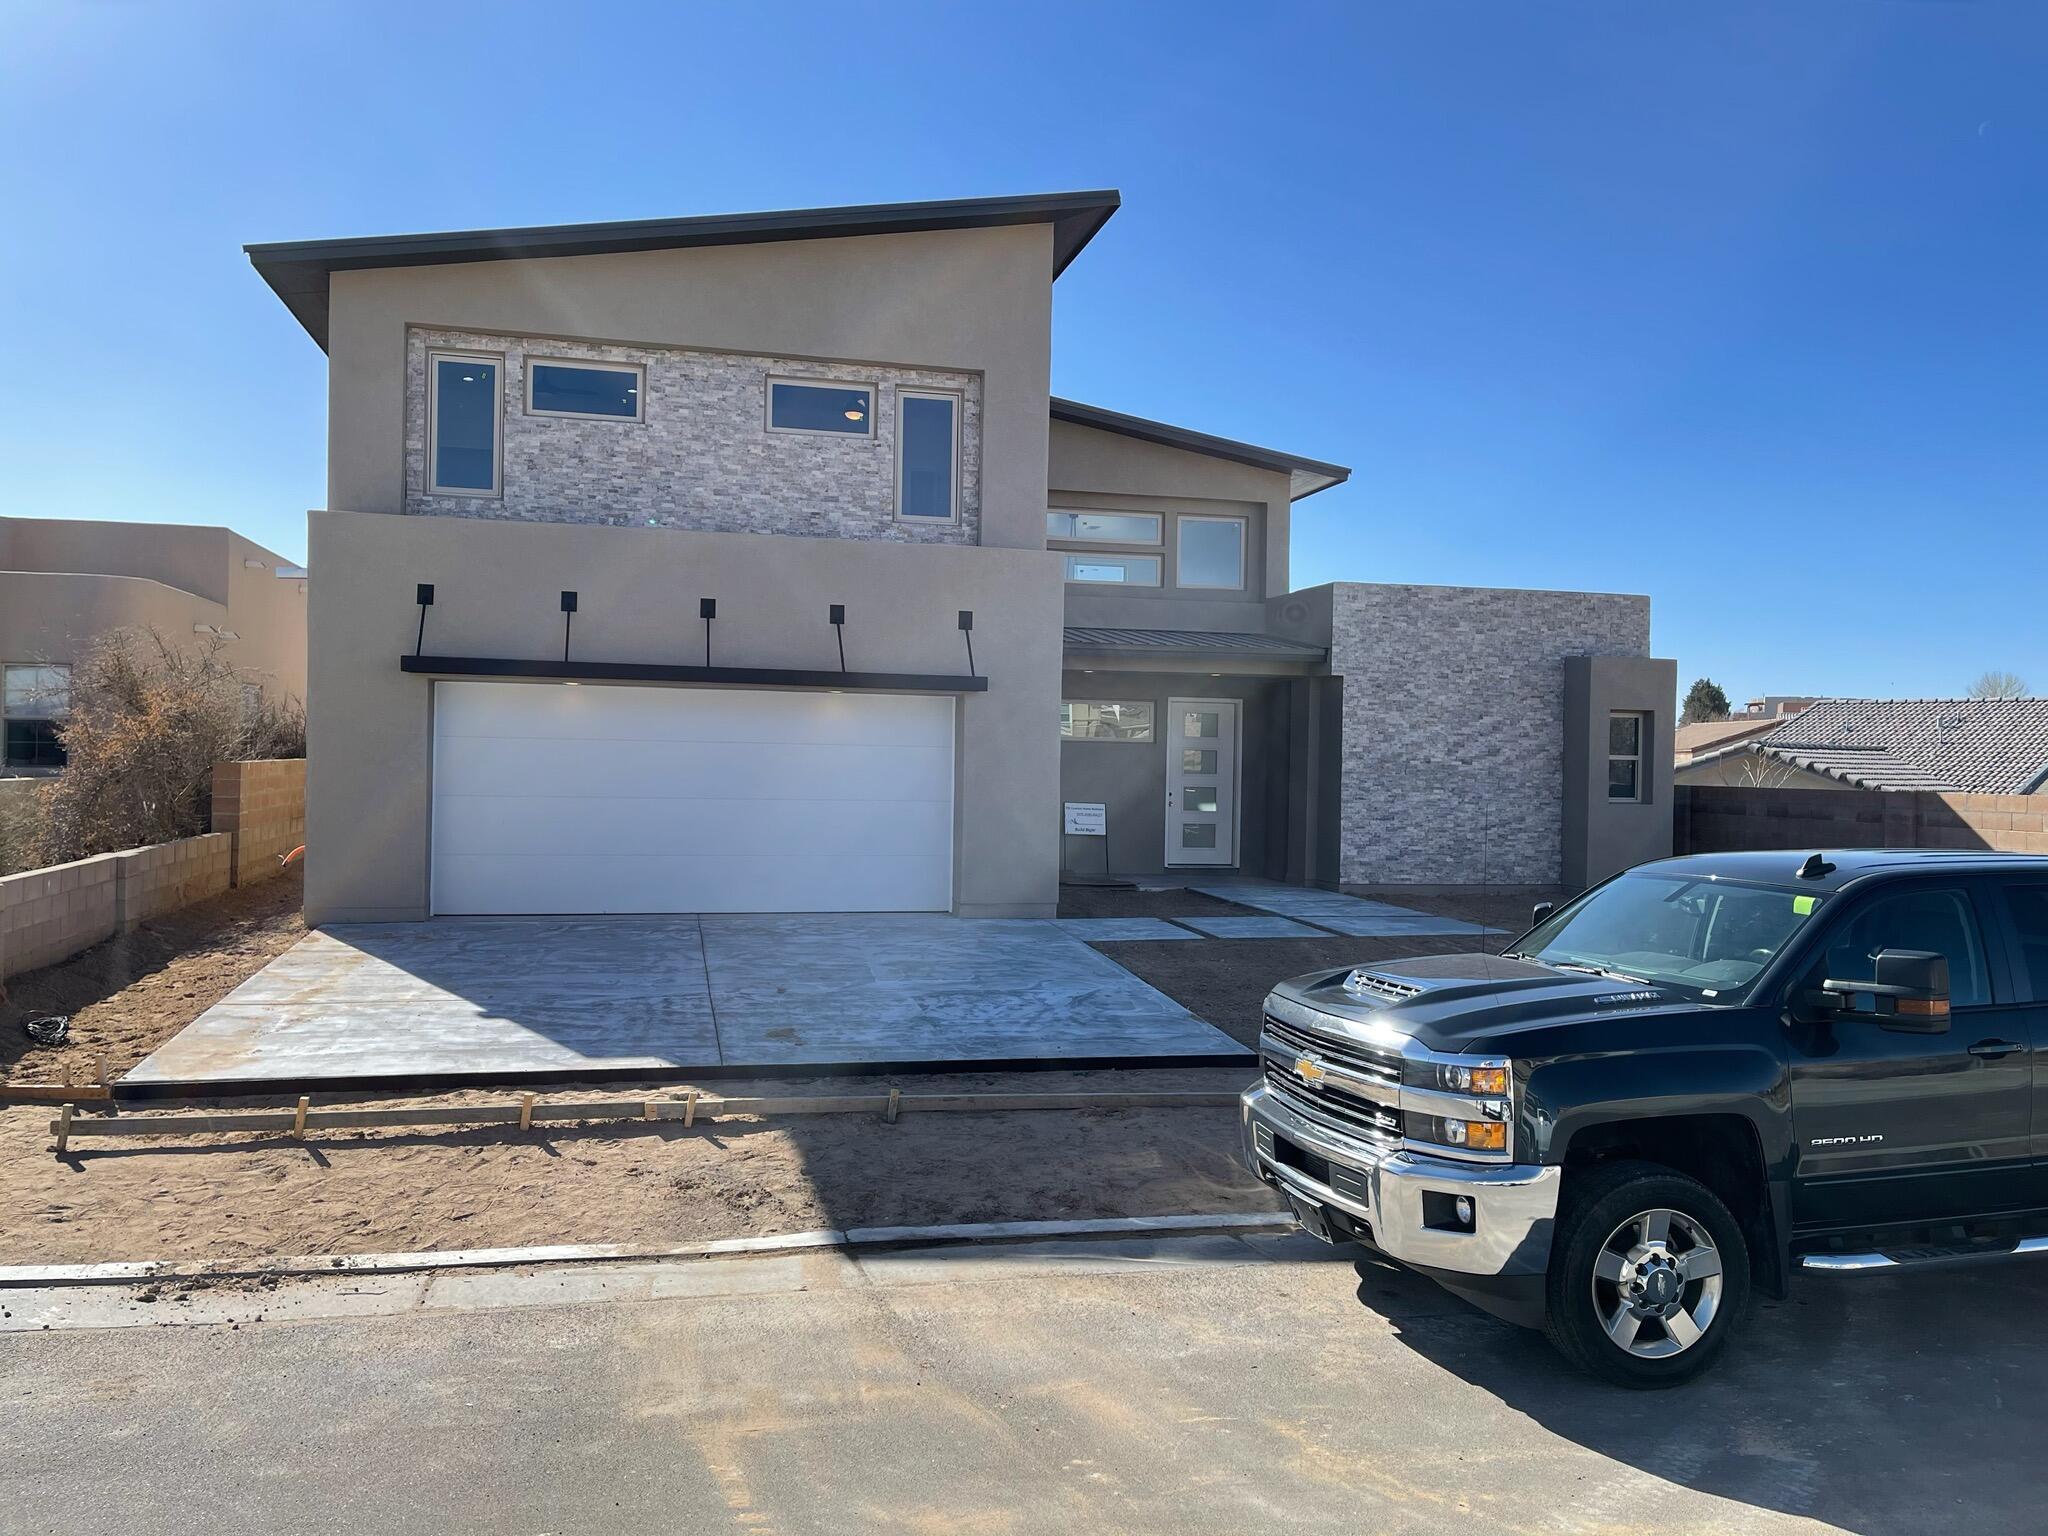 4548 ARROWHEAD Avenue, Albuquerque NM 87114